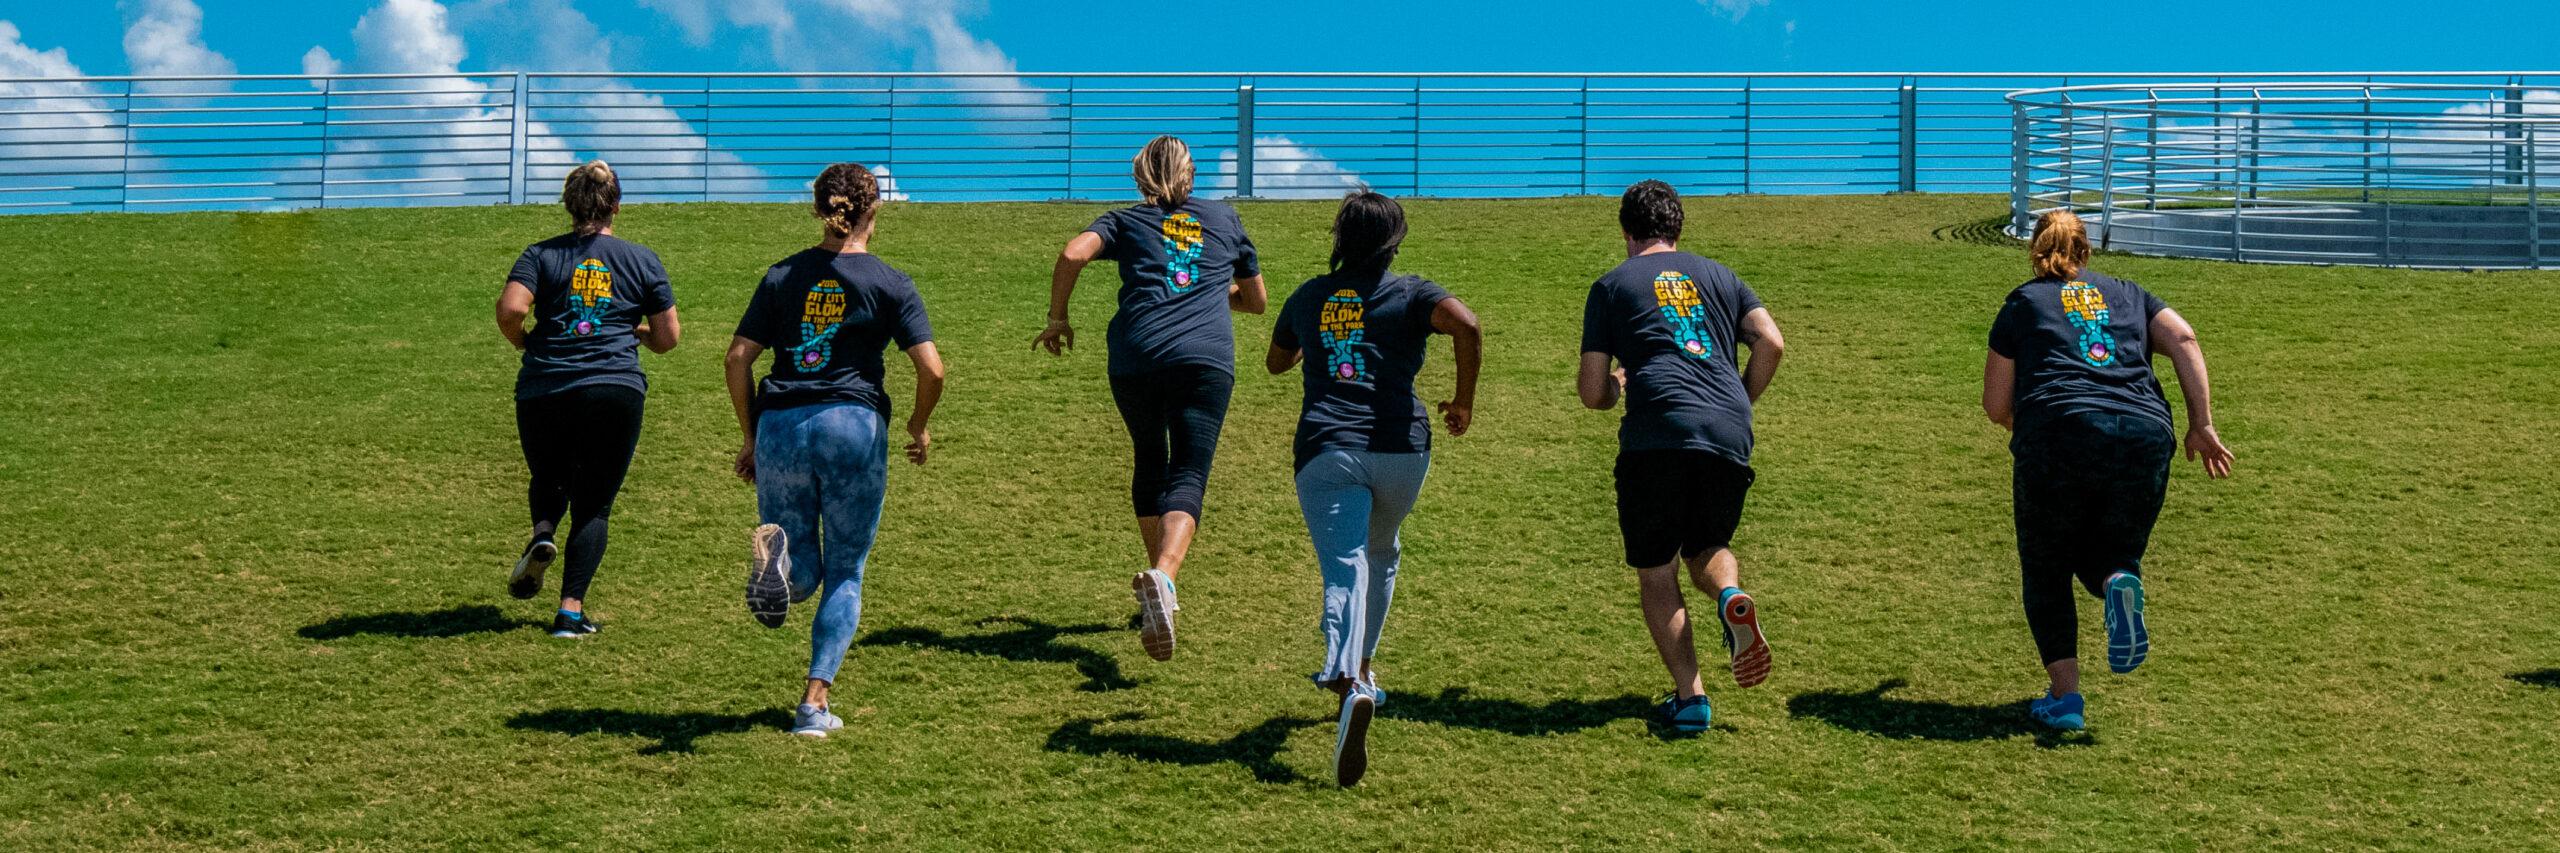 people running on grass